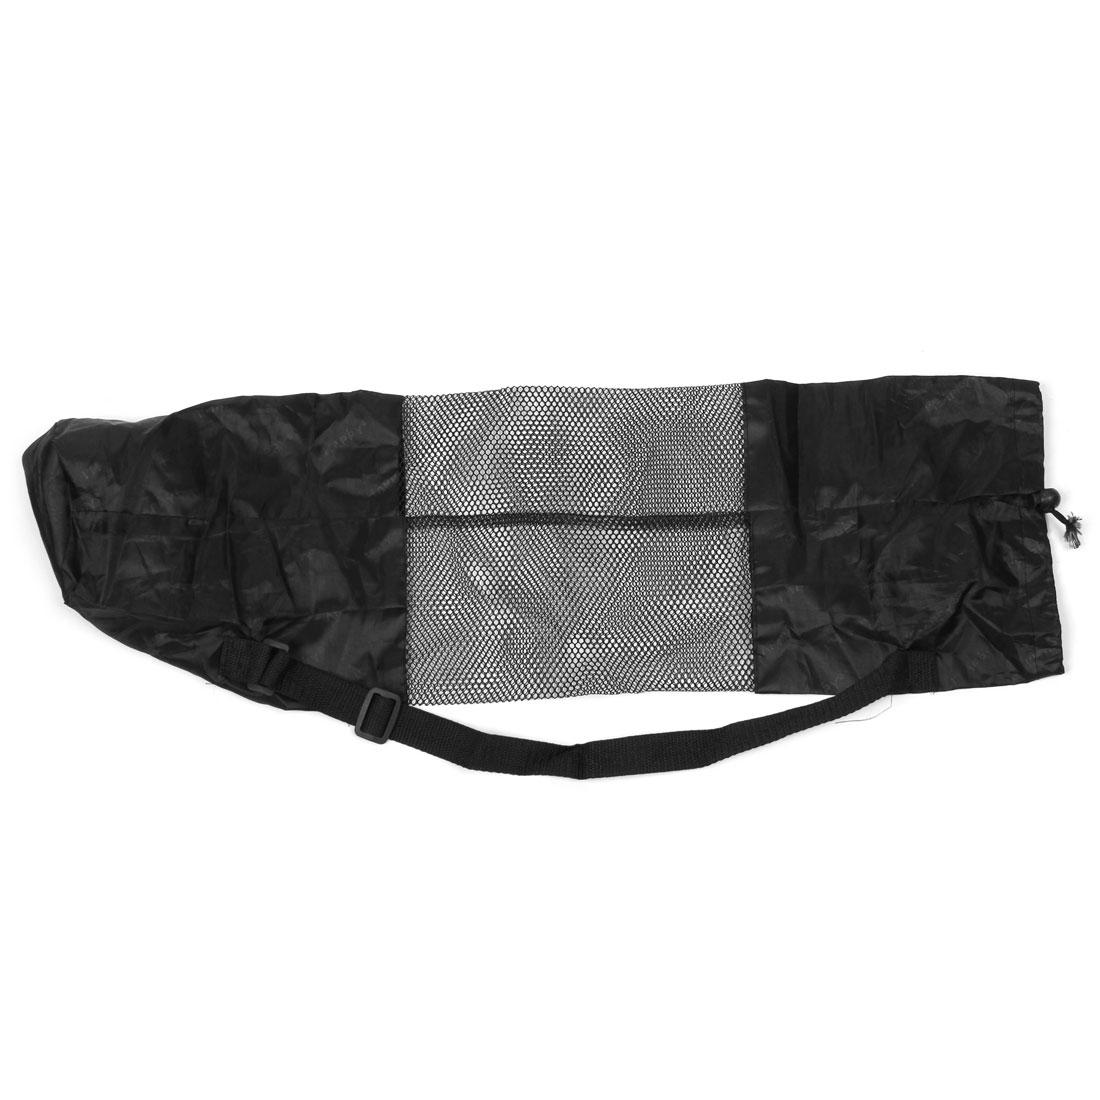 Unisex Nylon Mesh Washable Adjustable Strap Yoga Mat Carry Bag Holder Black